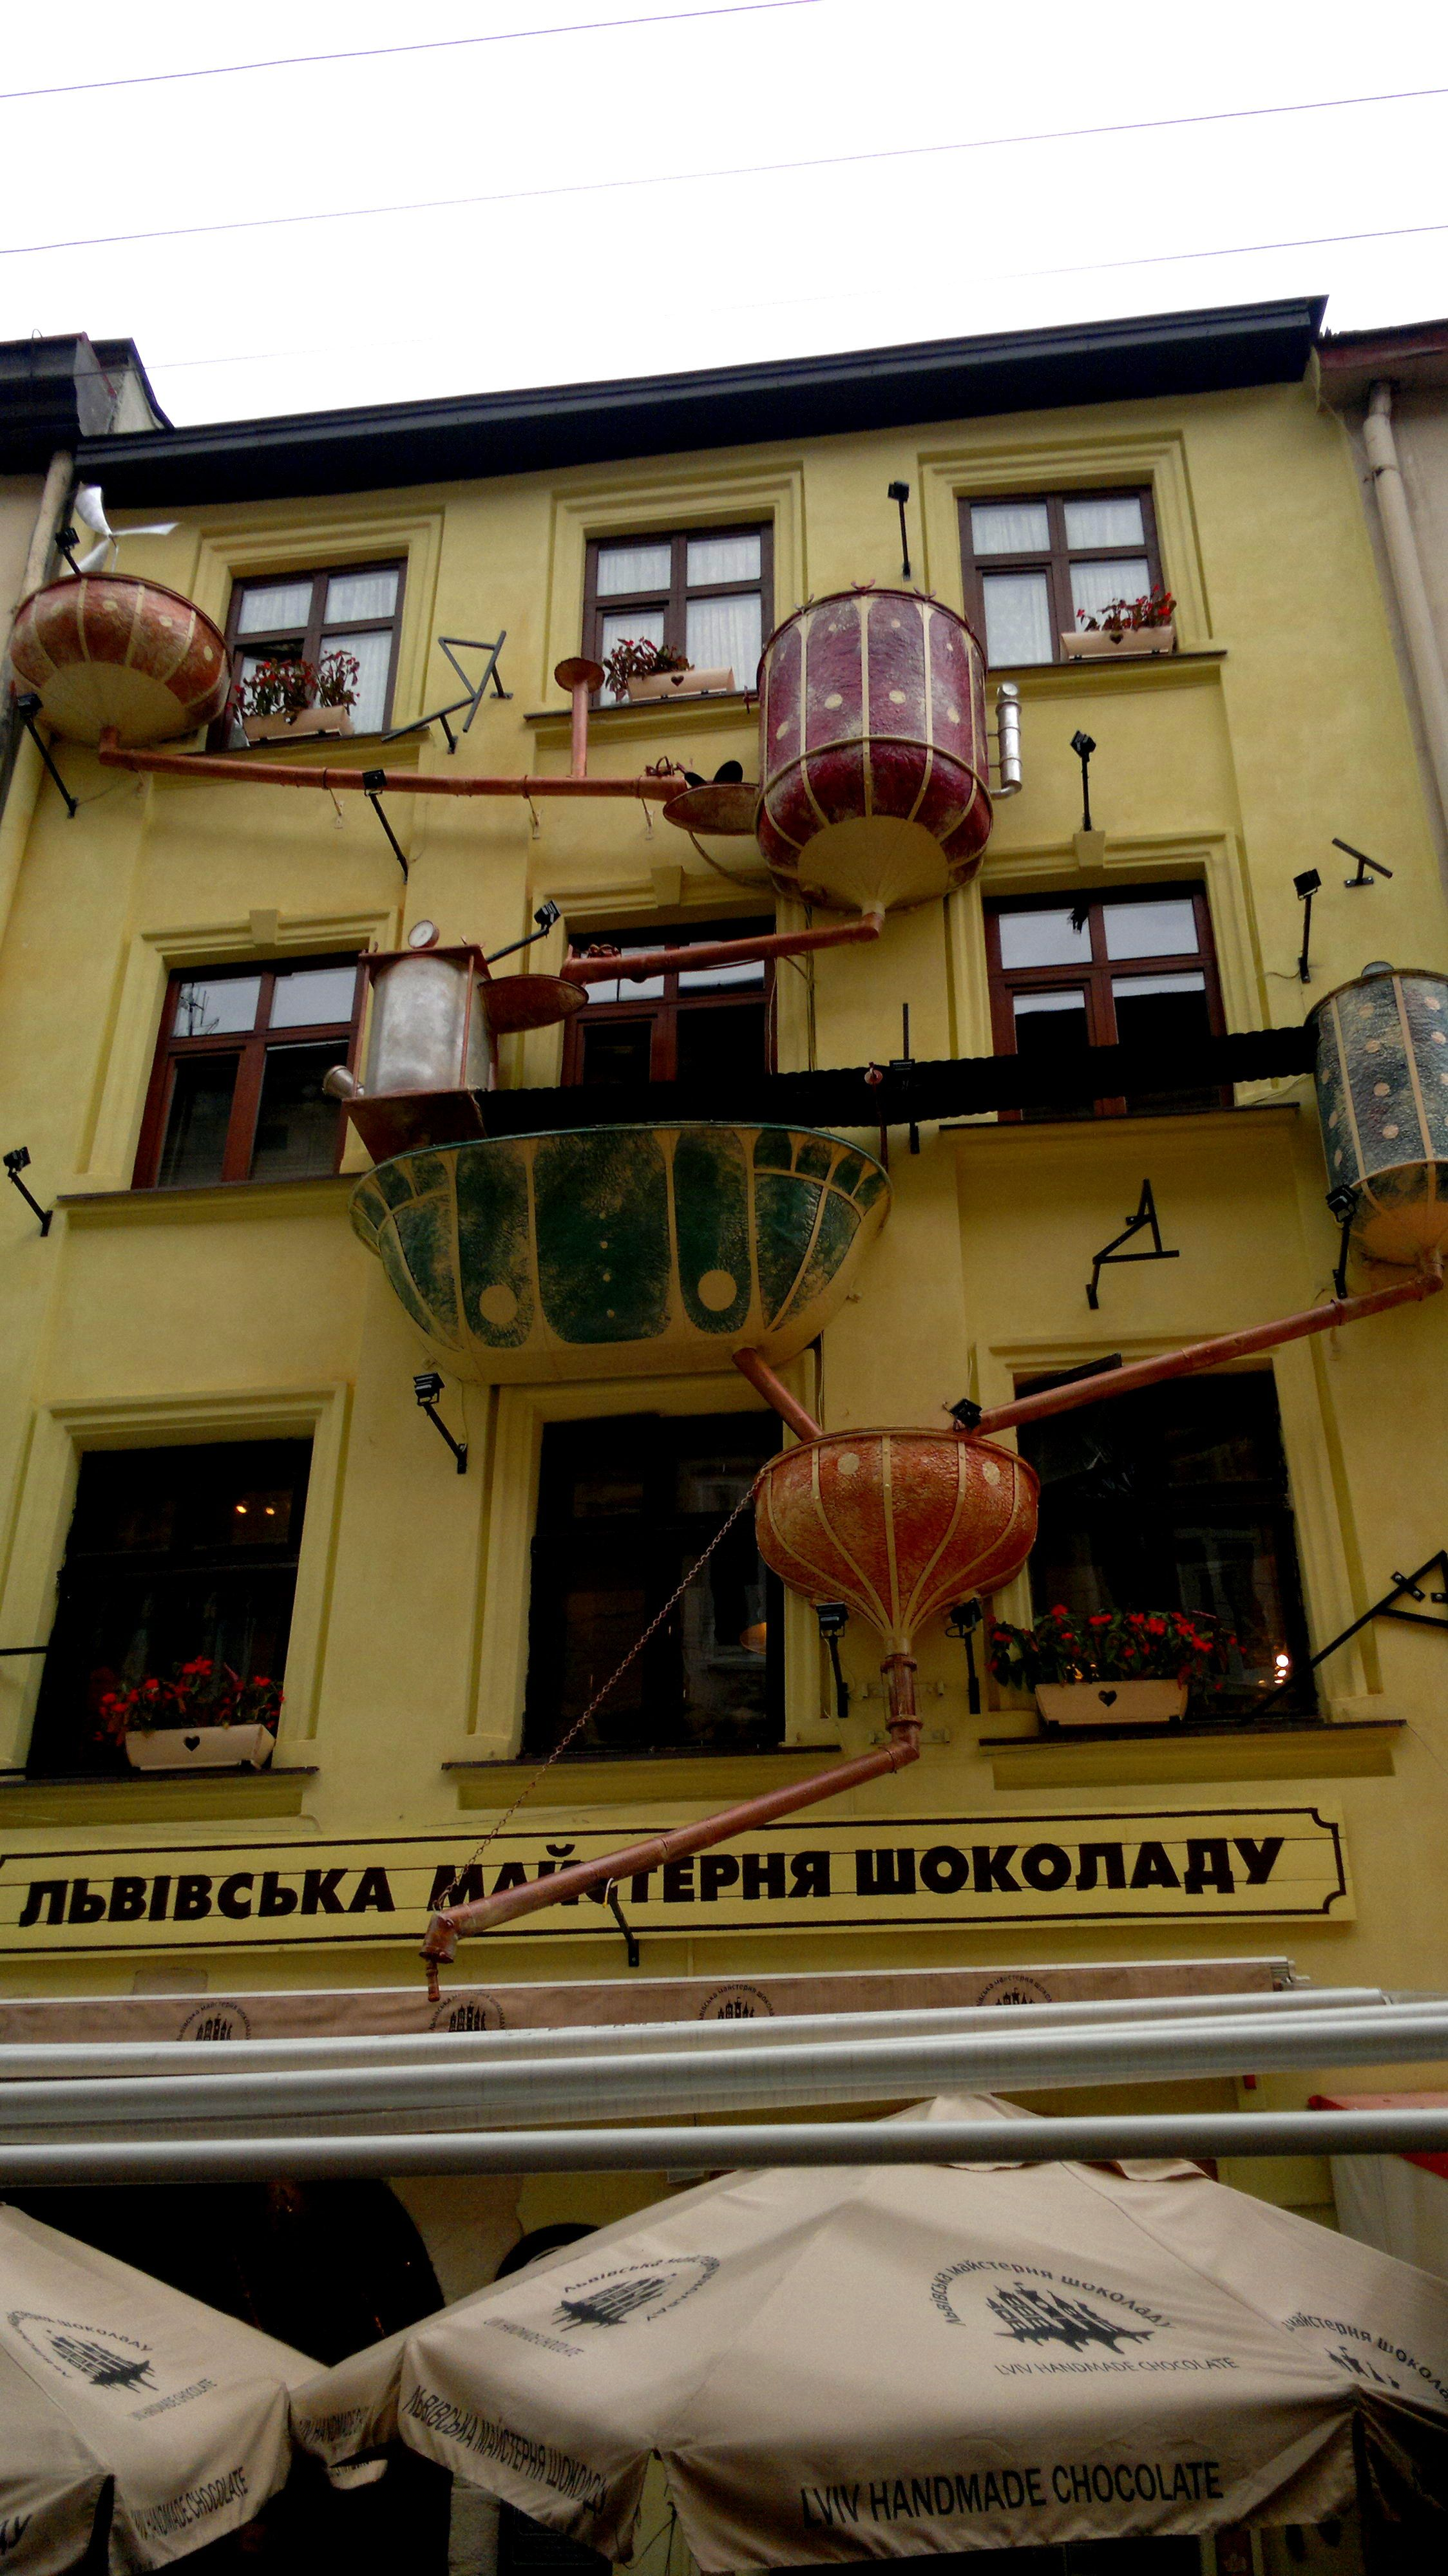 Lviv Ukraine The Chocolate Factory Lviv Ukraine Chocolate Factory